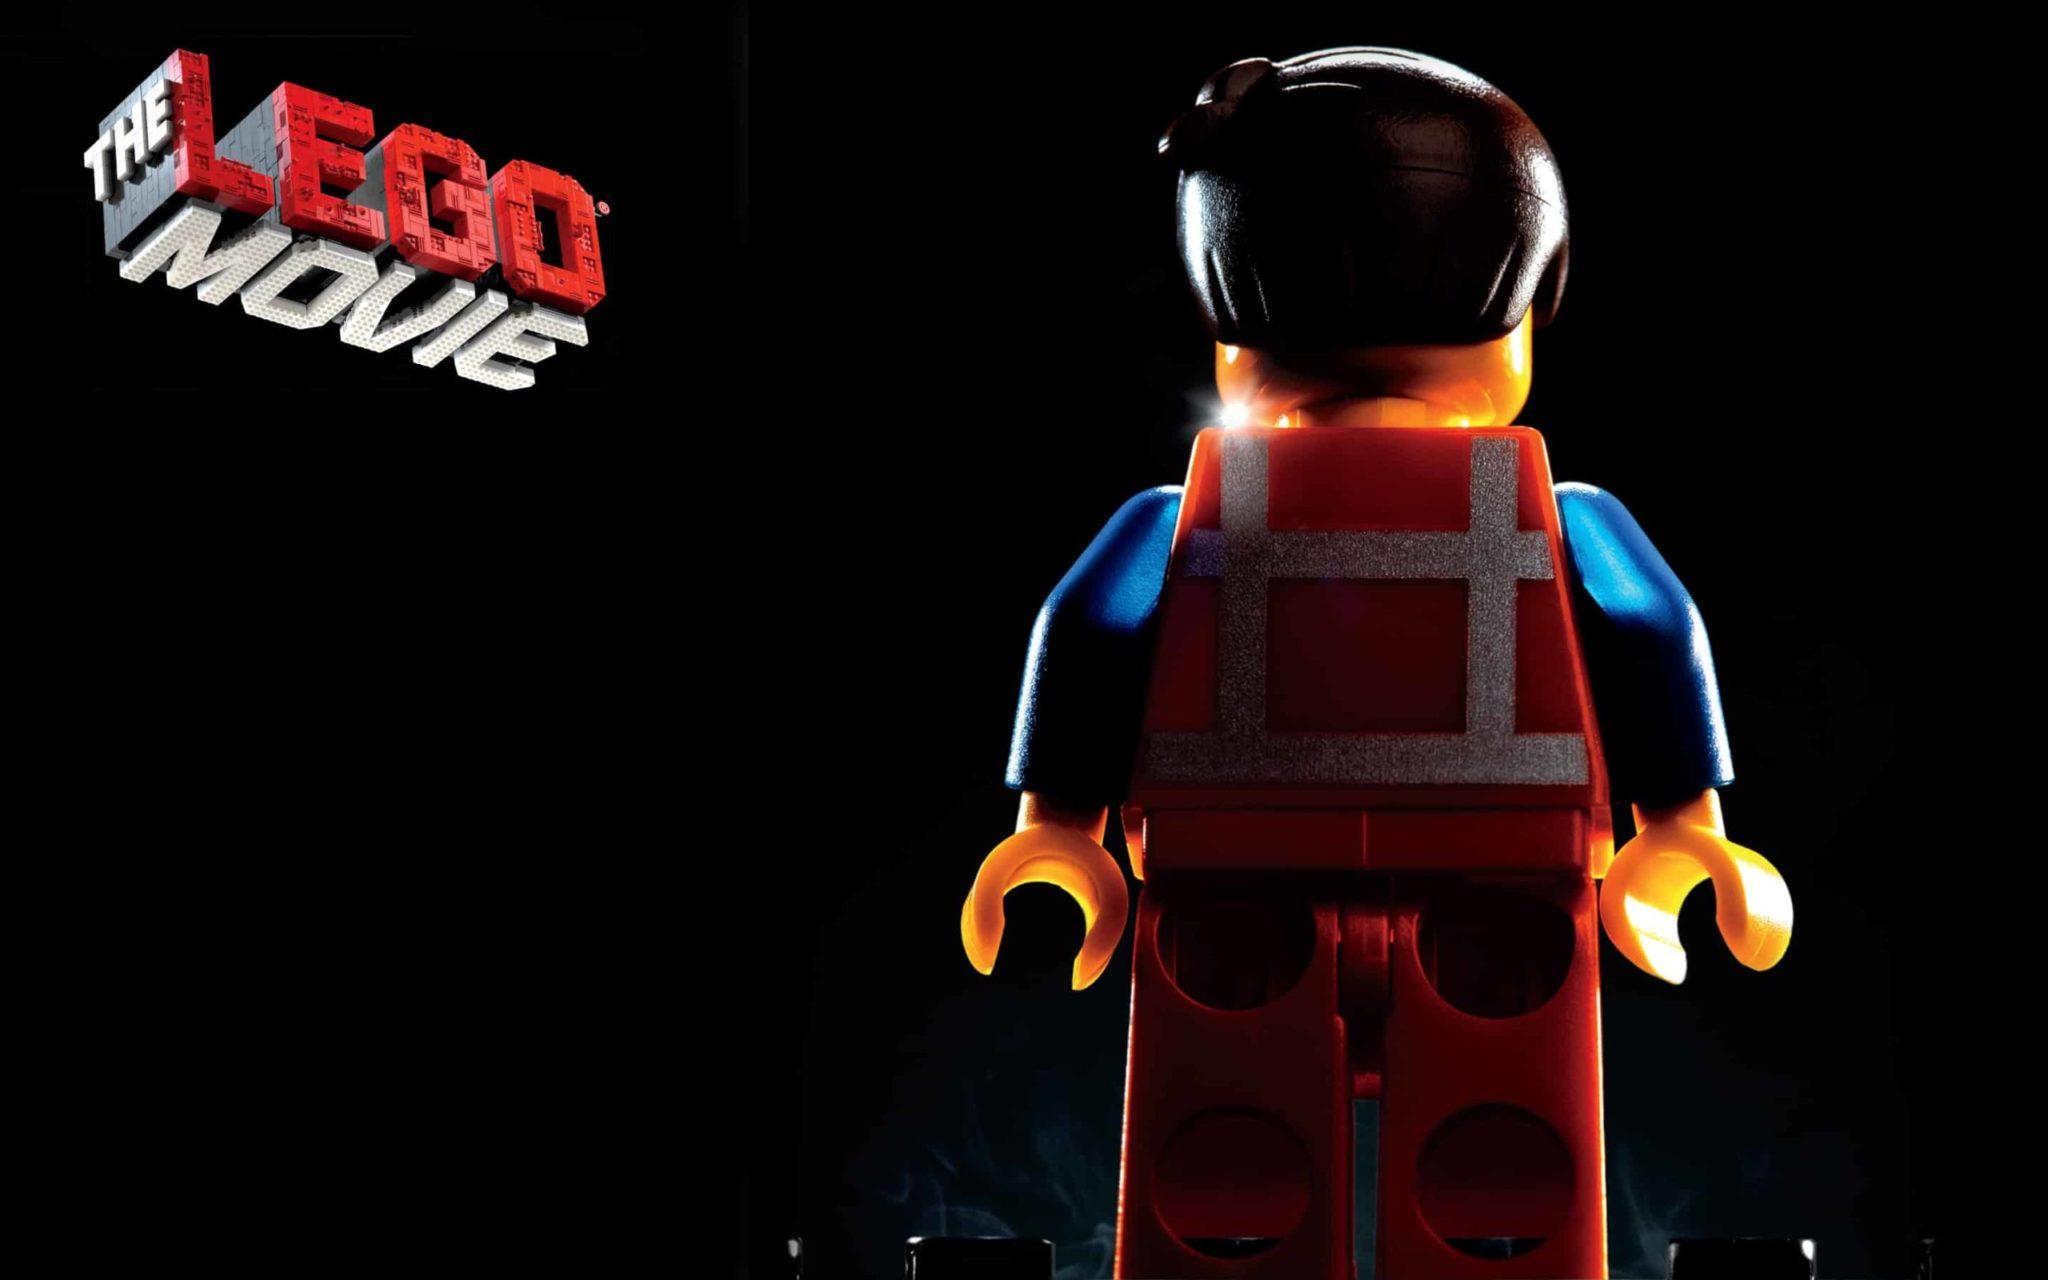 Imagen 'oscura' de The Lego Movie y su trailer de terror. Un fanático de The Lego Movie ha recreado The Lego Movie como una película de Terrero con un trailer mas oscuro. The Lego Movie es dirigida por Phil Lord y Chris Miller y estelarizada por Chris Pratt, Elizabeth Banks, Will Ferrell, Channing Tatum, Cobie Smulders, Jonah Hill, Liam Neeson, Morgan Freeman, Alison Brie, Nick Offerman, Will Arnett, Charlie Day.